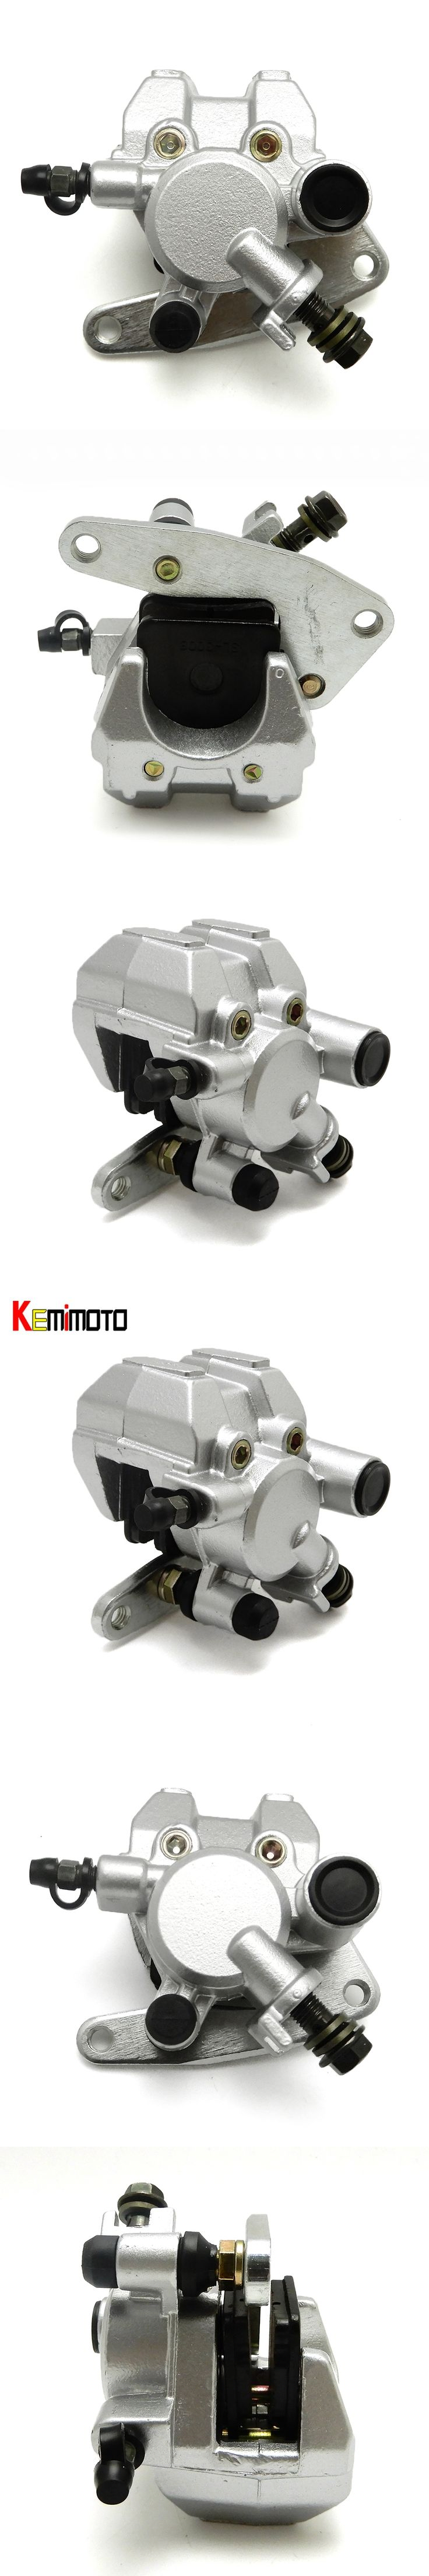 KEMiMOTO ATV for YAMAHA BANSHEE 350 WOLVERINE 350 4X4 RAPTOR 660WARRIOR 350 Left Front Brake Caliper Cylinder